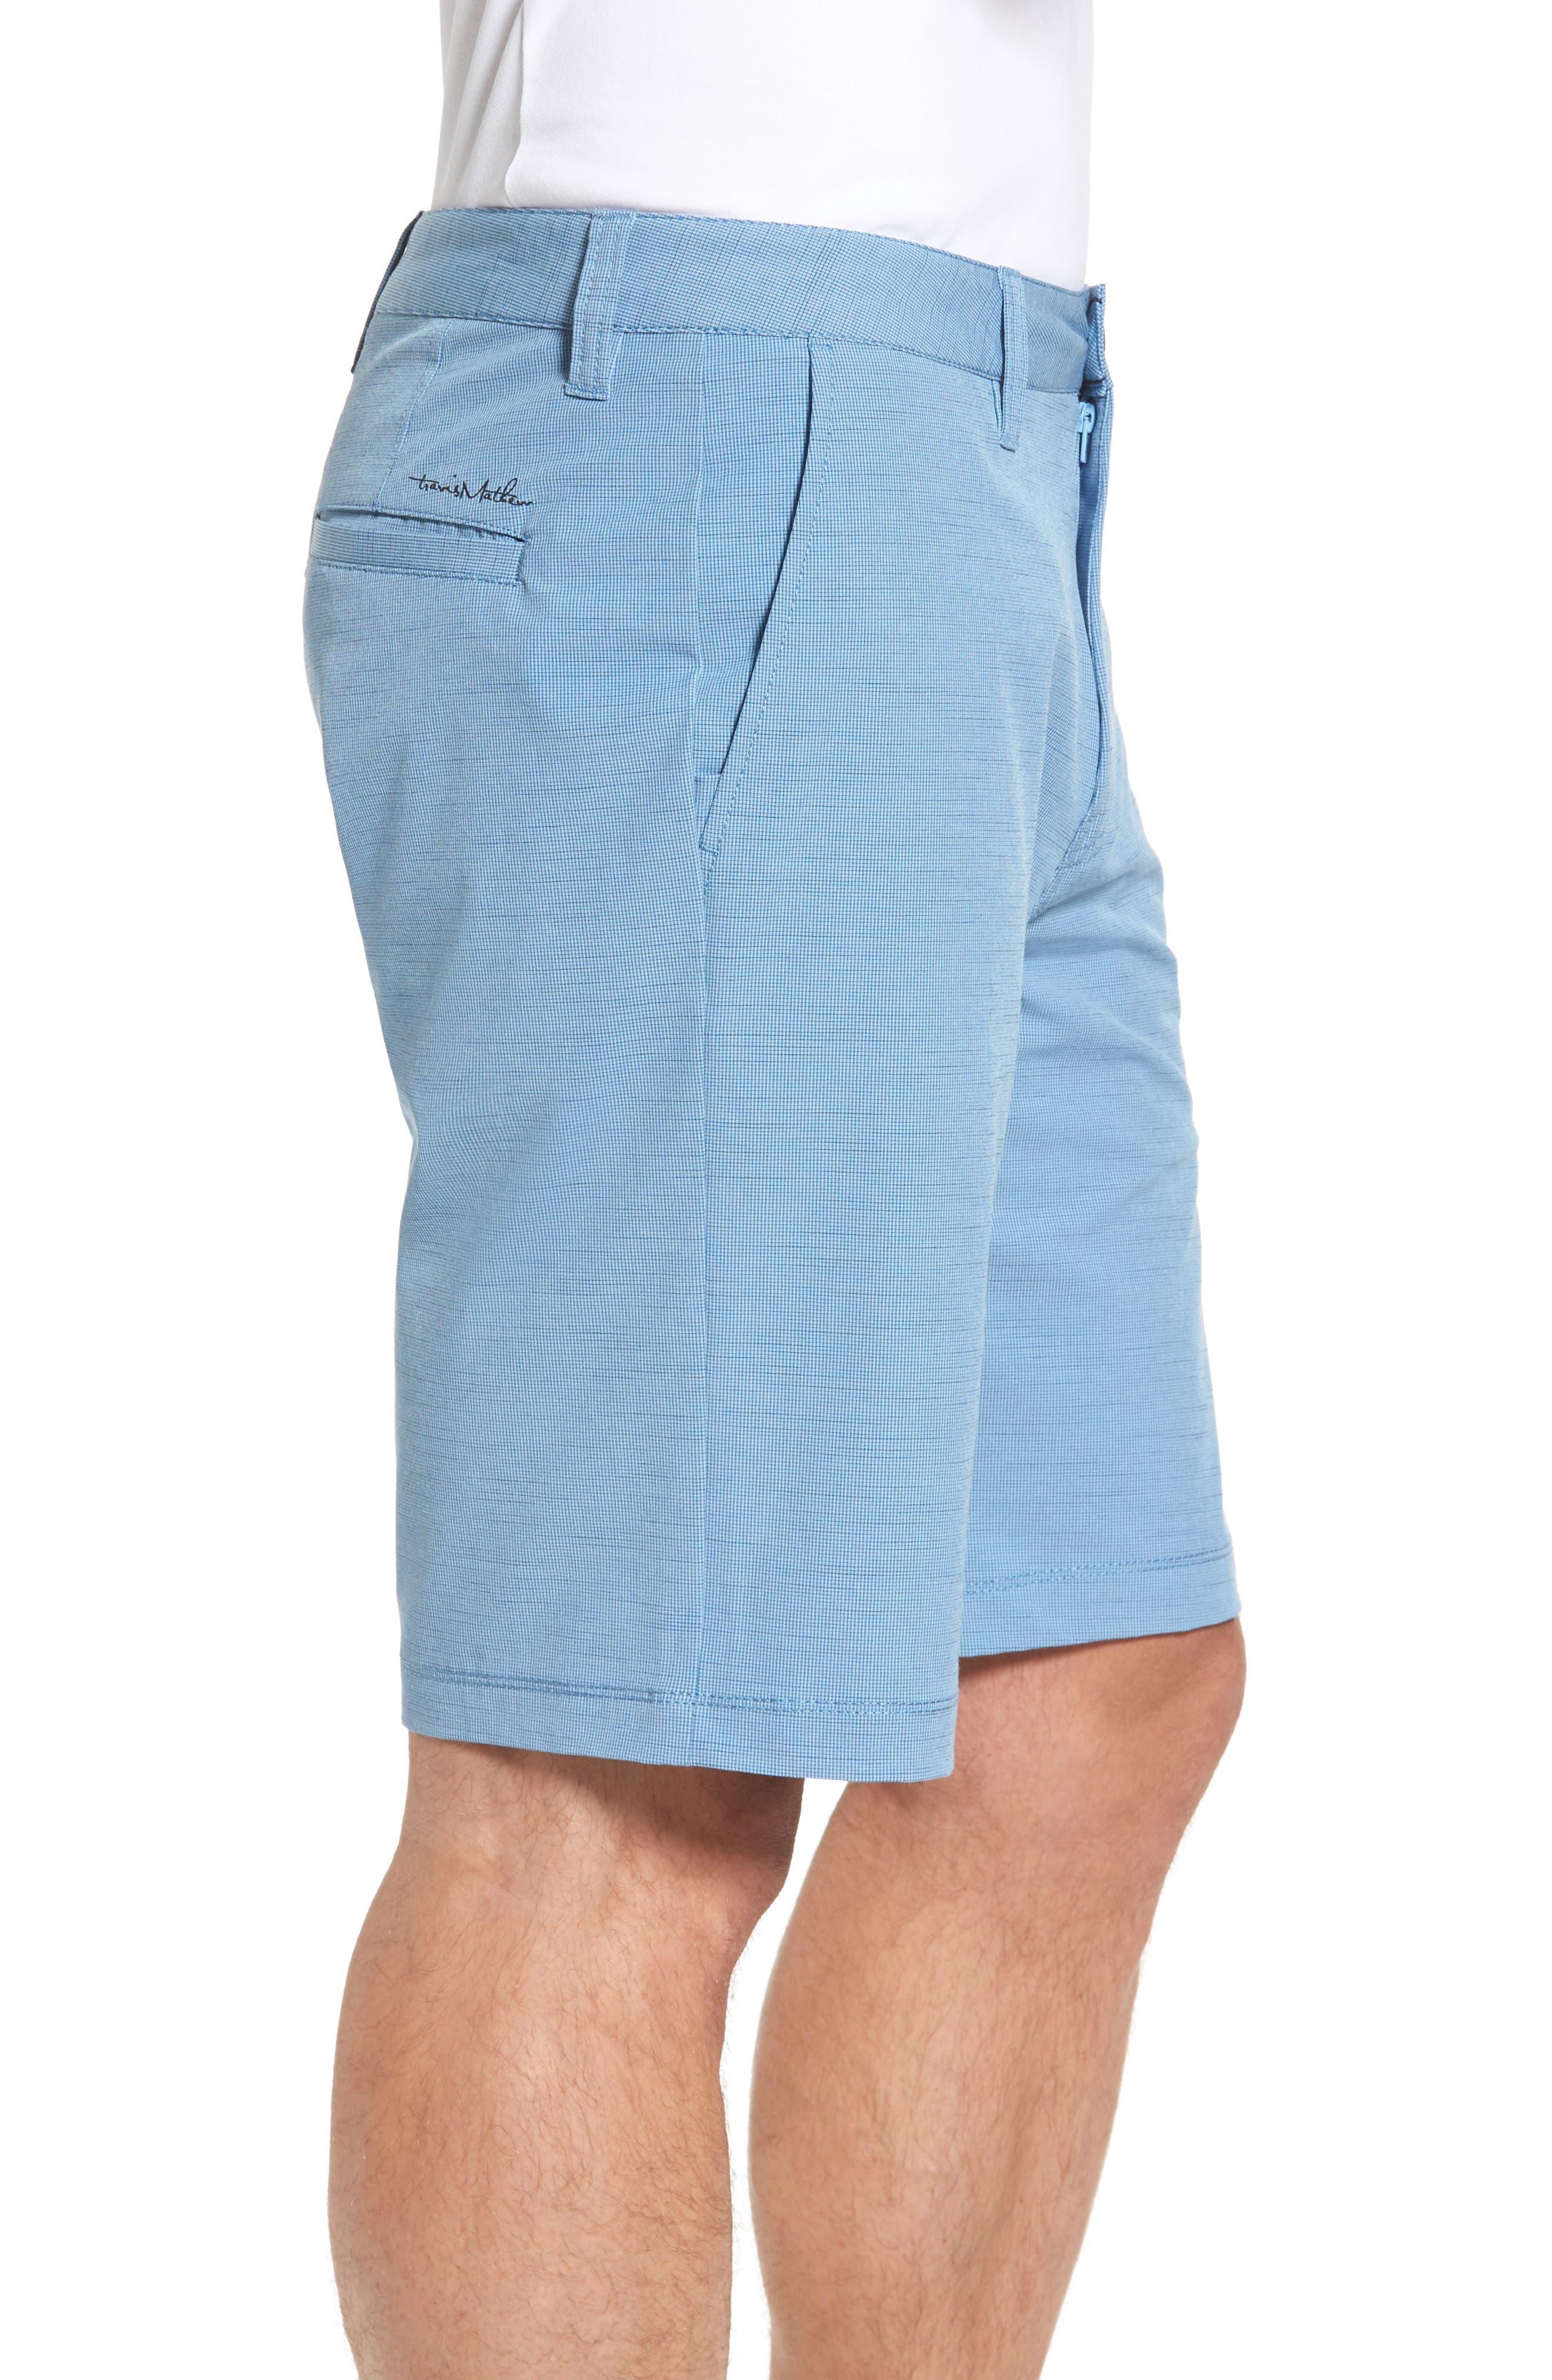 Fisher Shorts,                             Alternate thumbnail 3, color,                             401